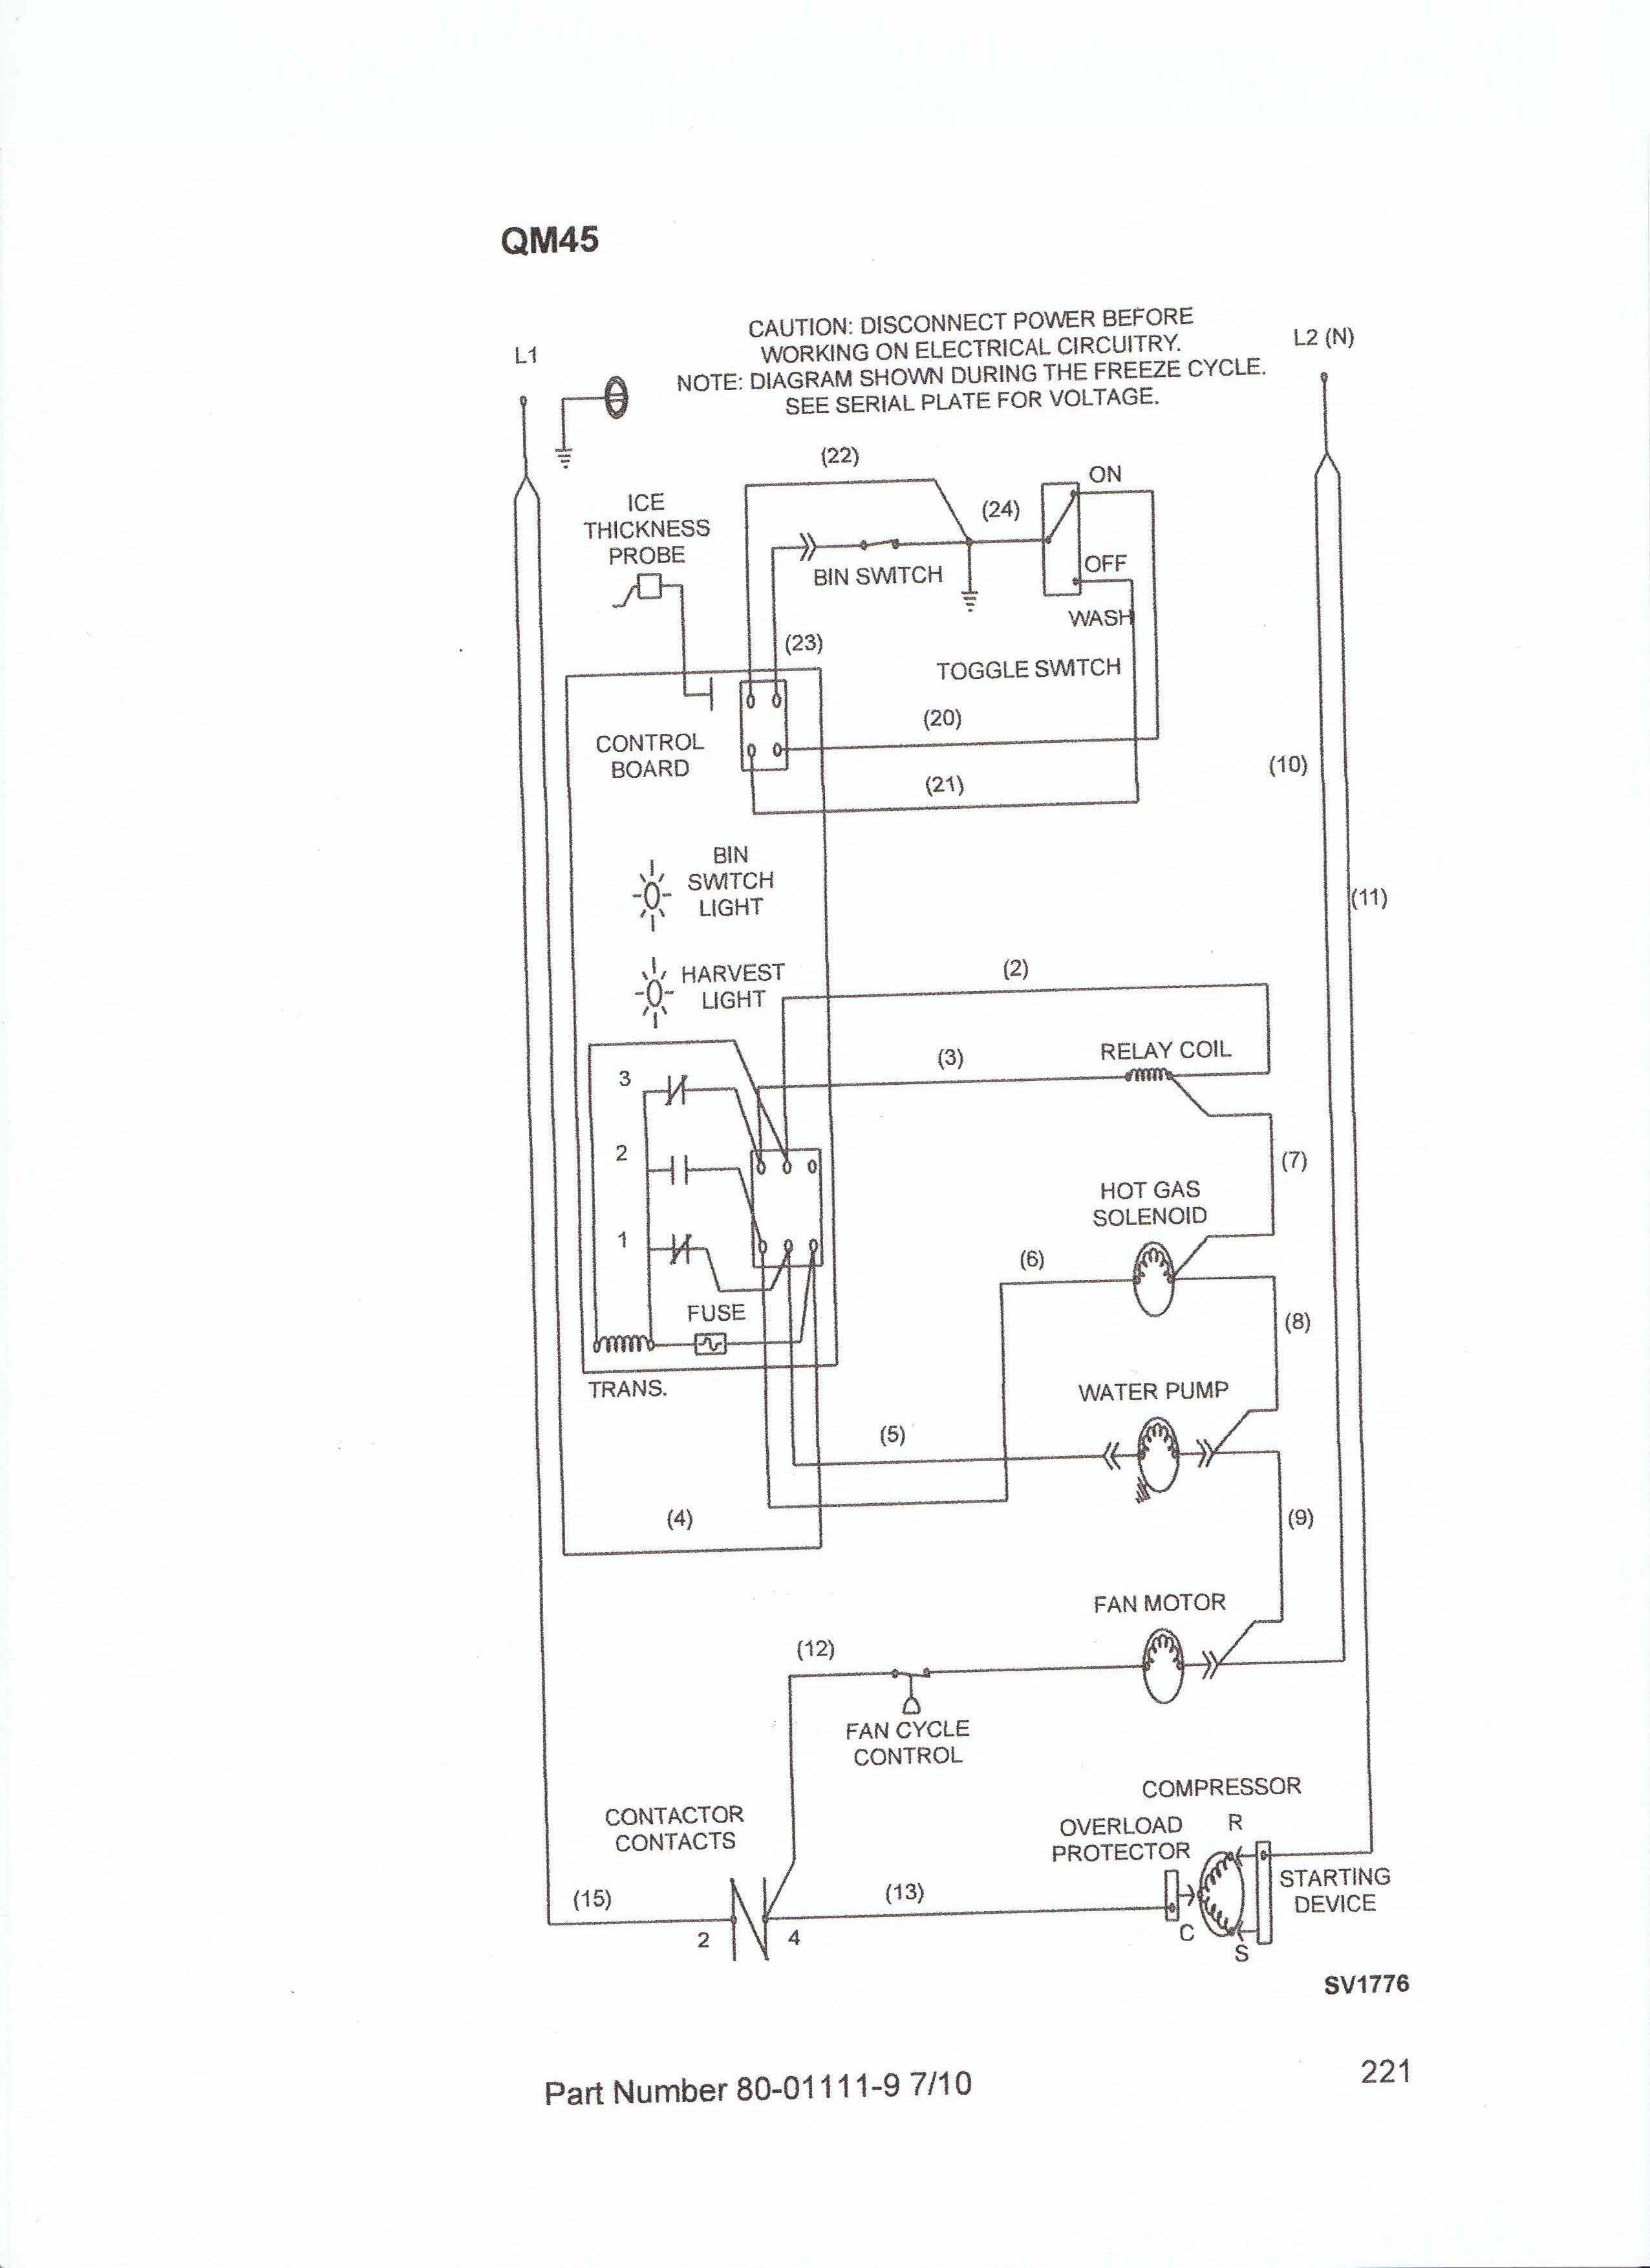 cornelius ice machine wire diagram whirlpool ice machine wiring diagram manitowoc qd0212a ice maker problem